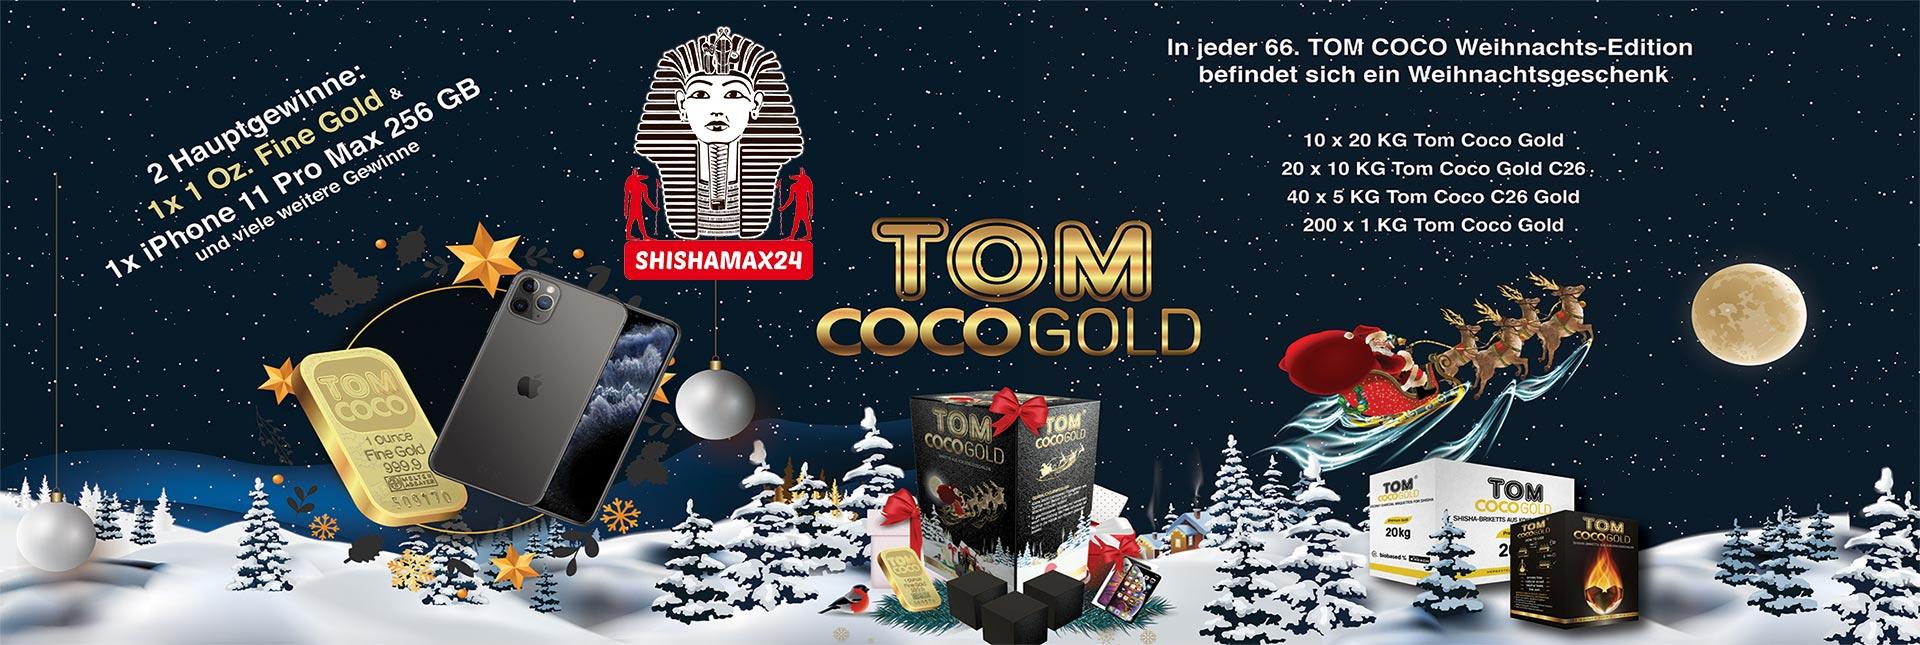 TOM COCOGOLD